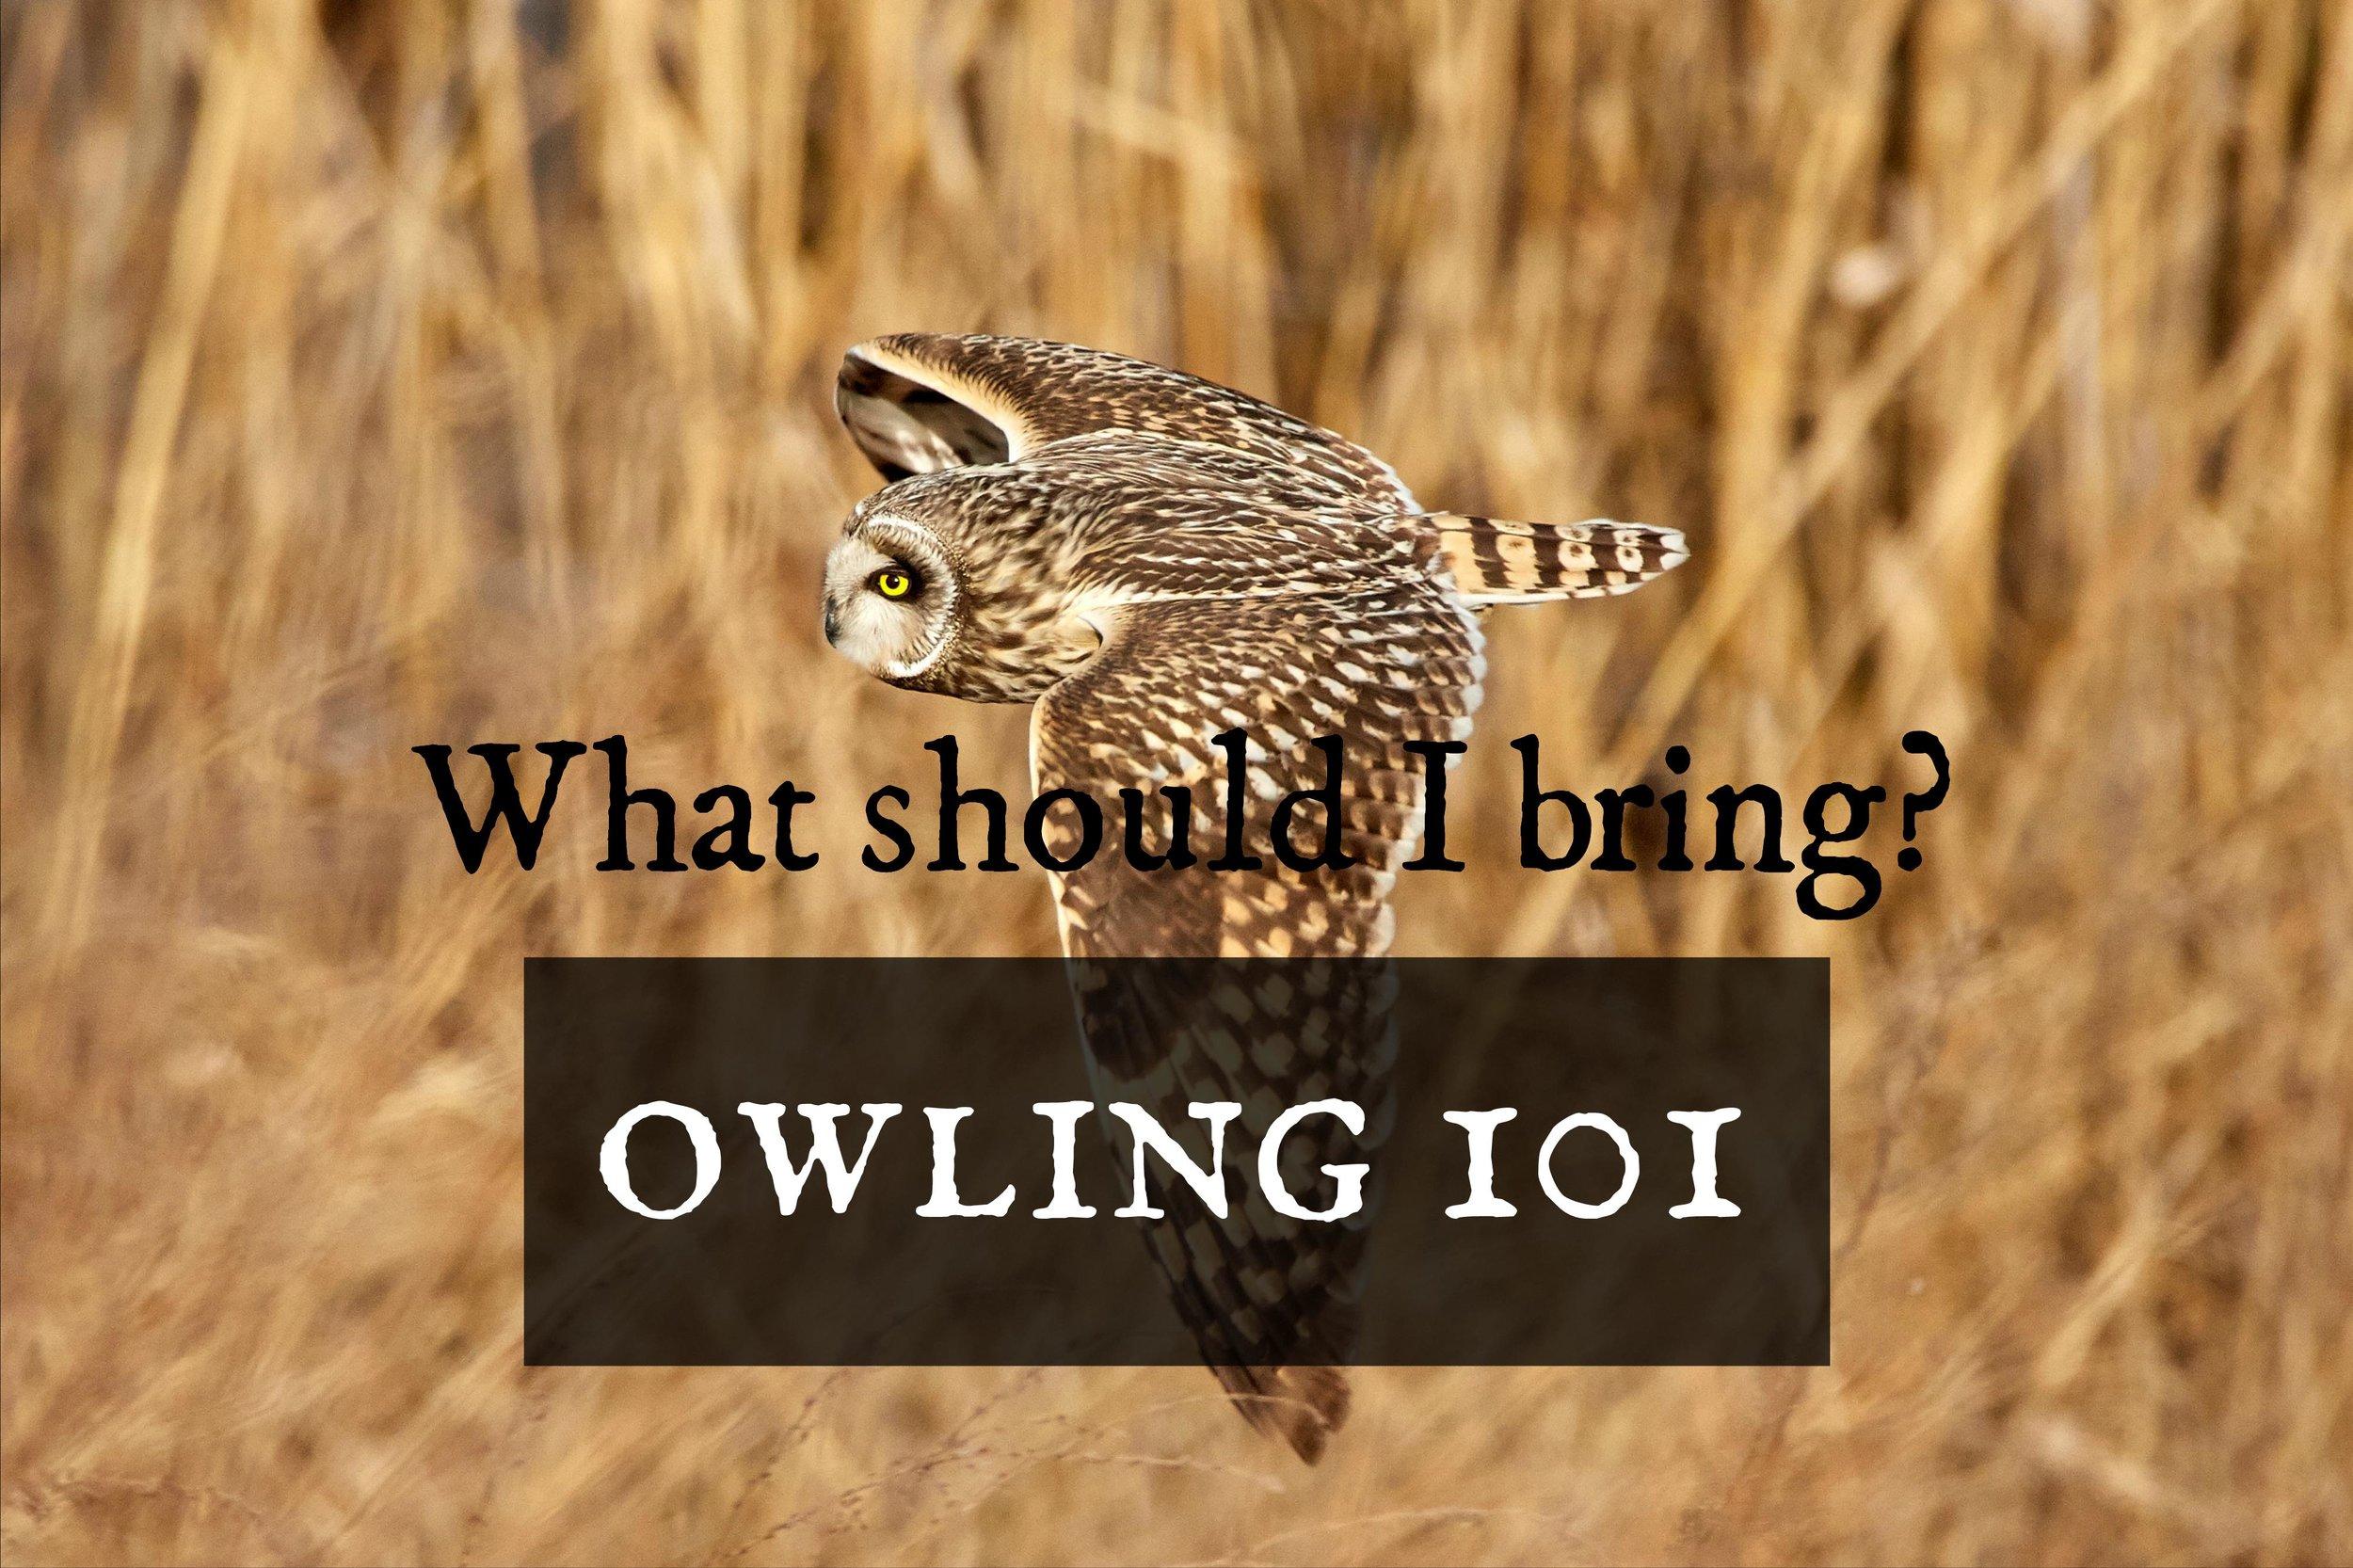 owling101-whattobring.jpg